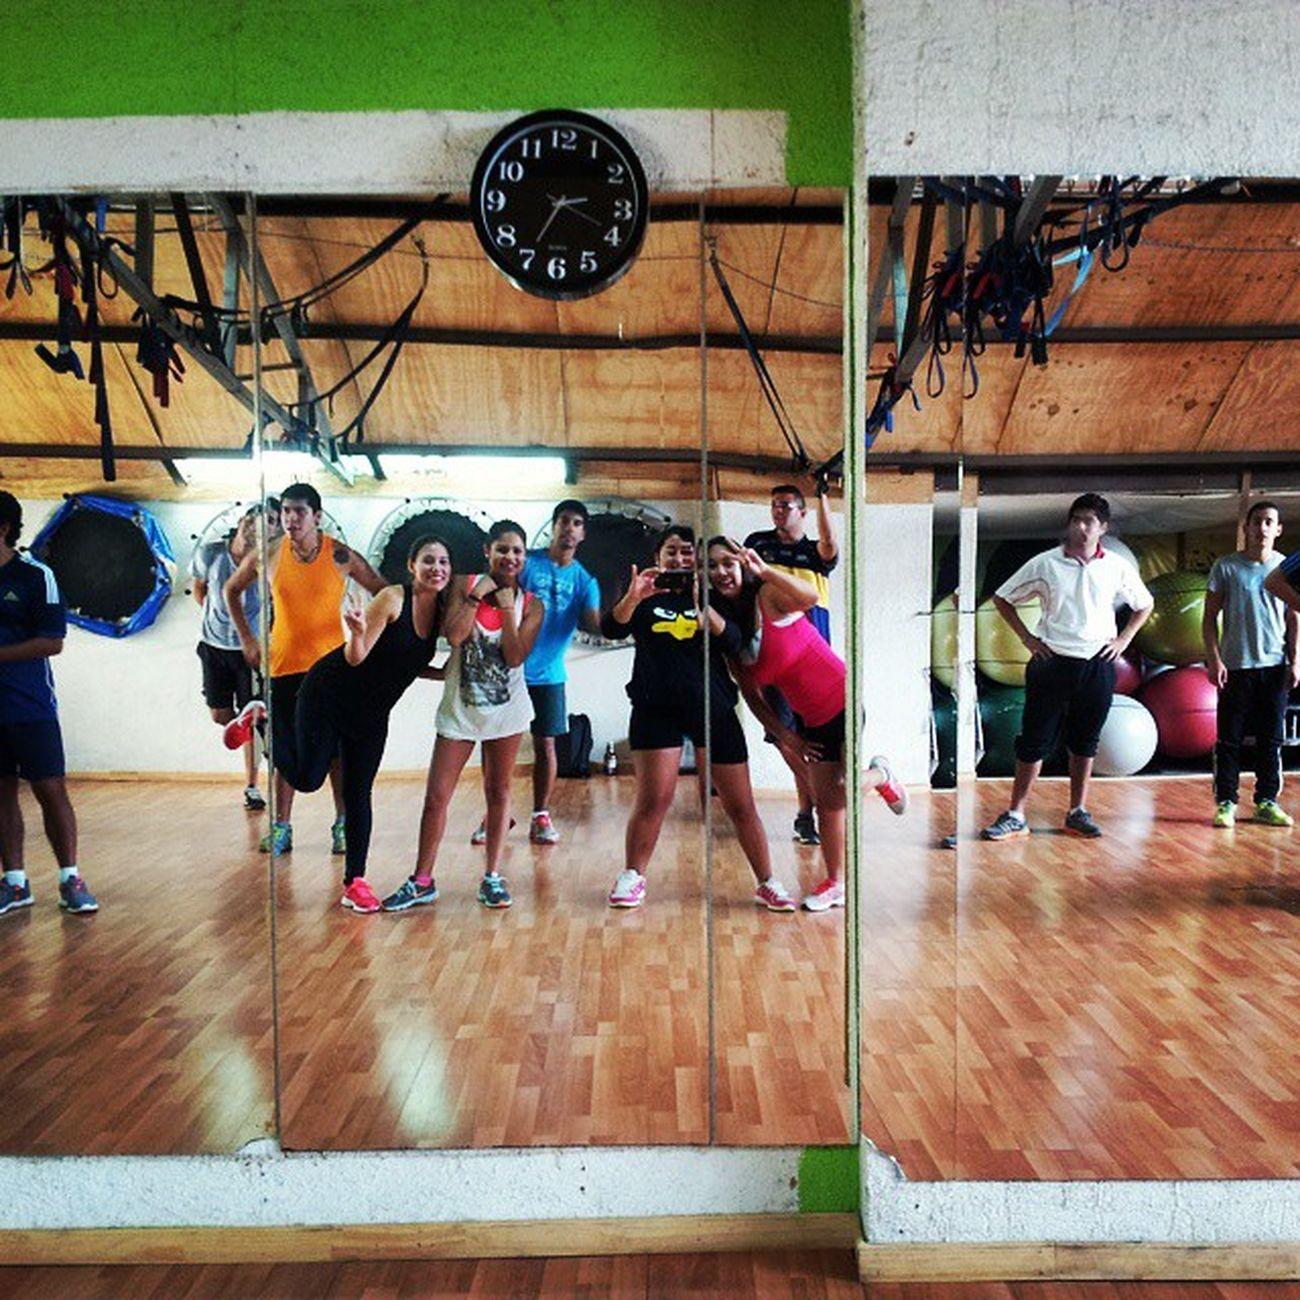 Baile entretenido 🙌 Santotomas Chiquillos Amorir PF2015